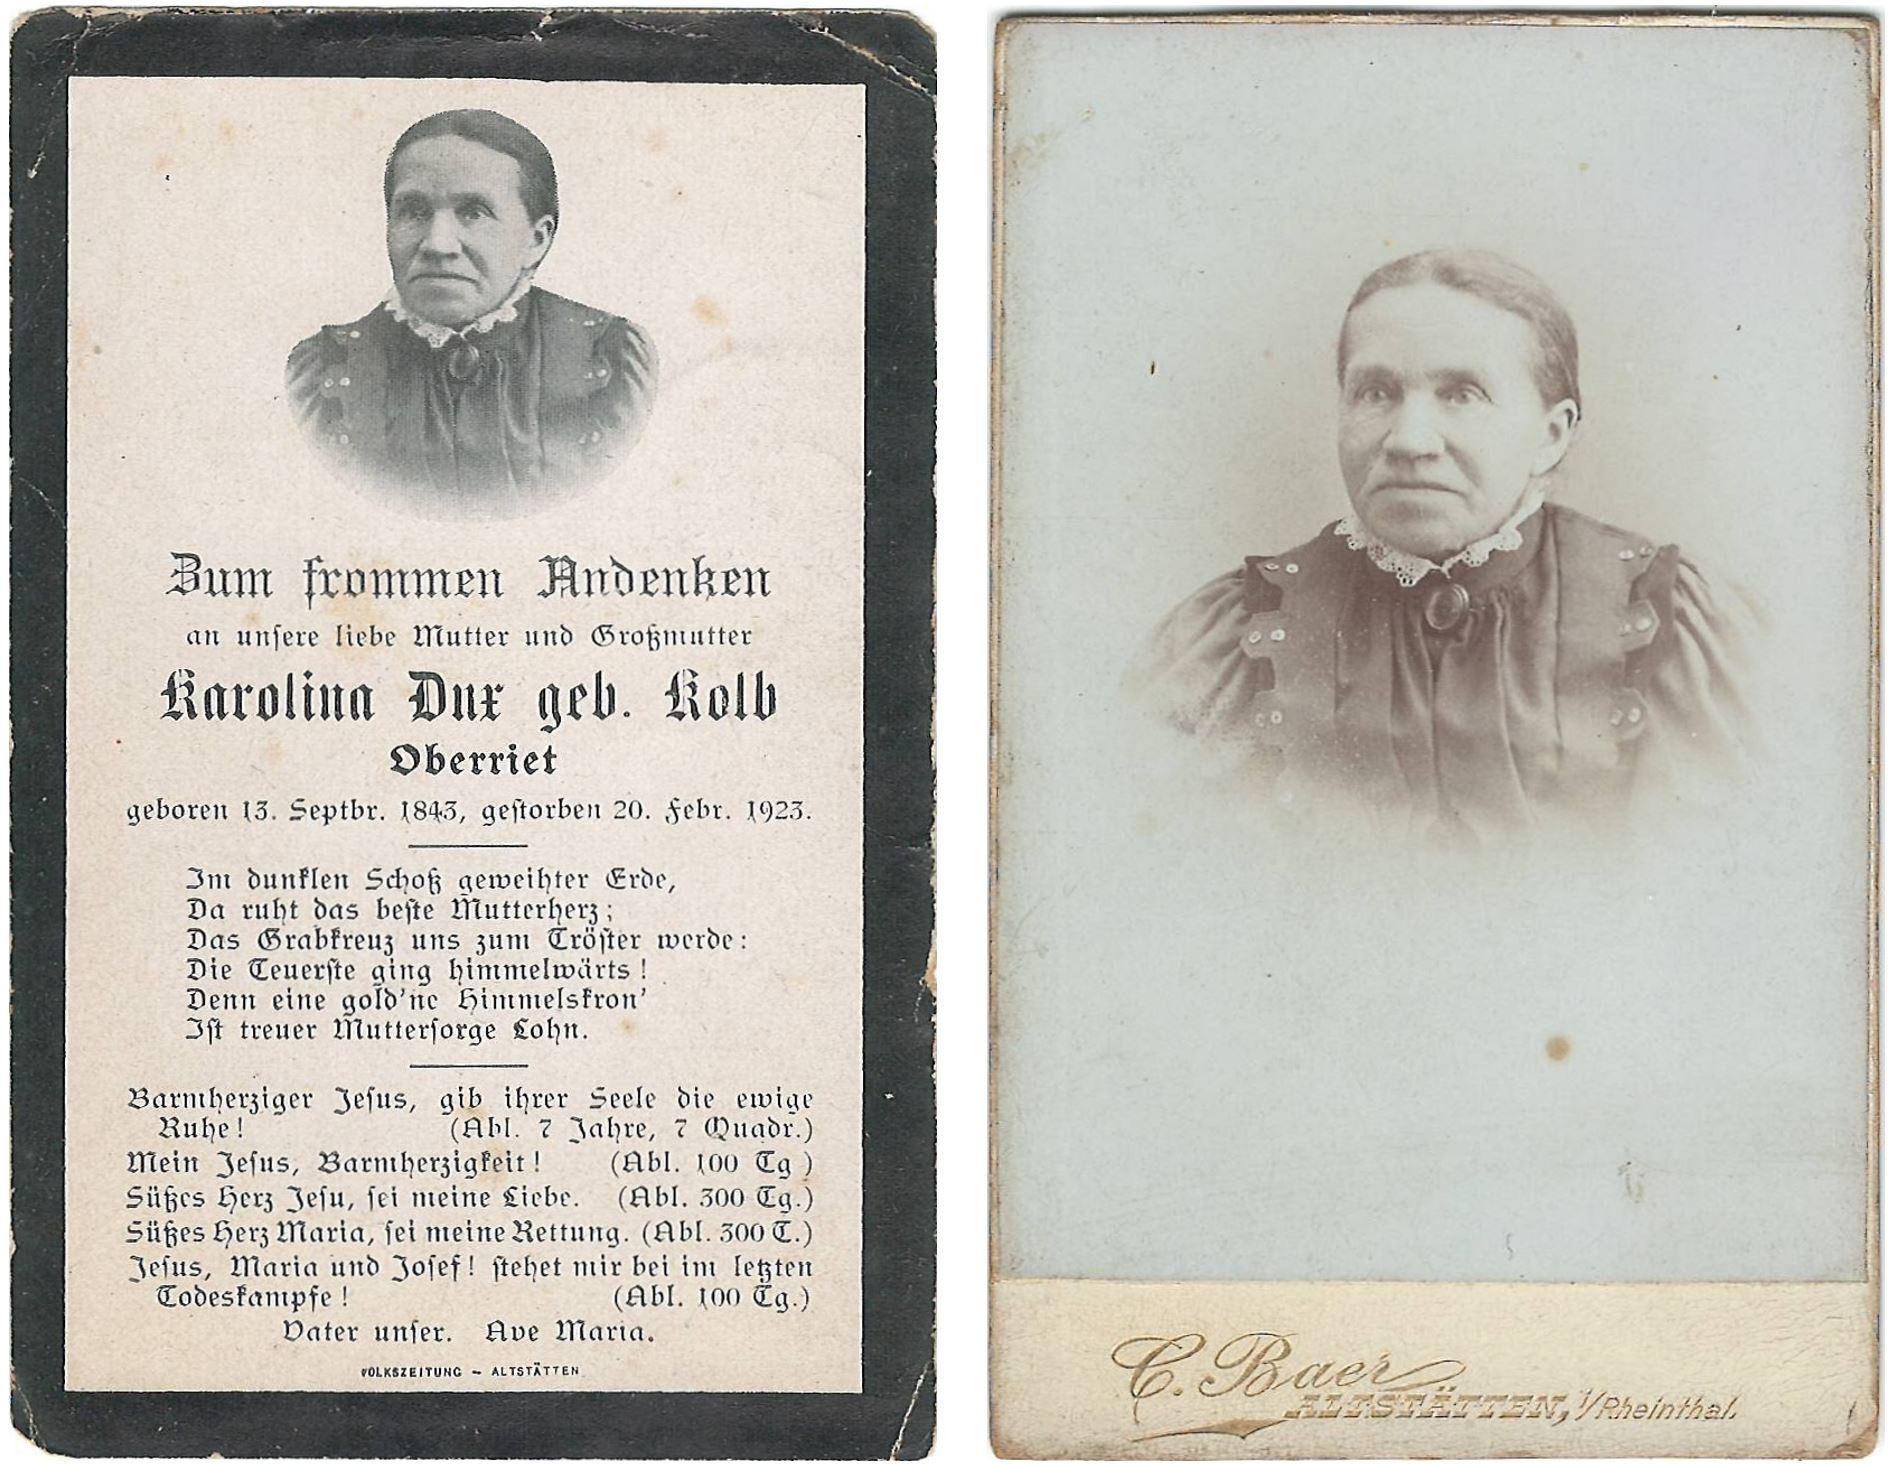 Karolina Dux-Kolb (1843-1923)